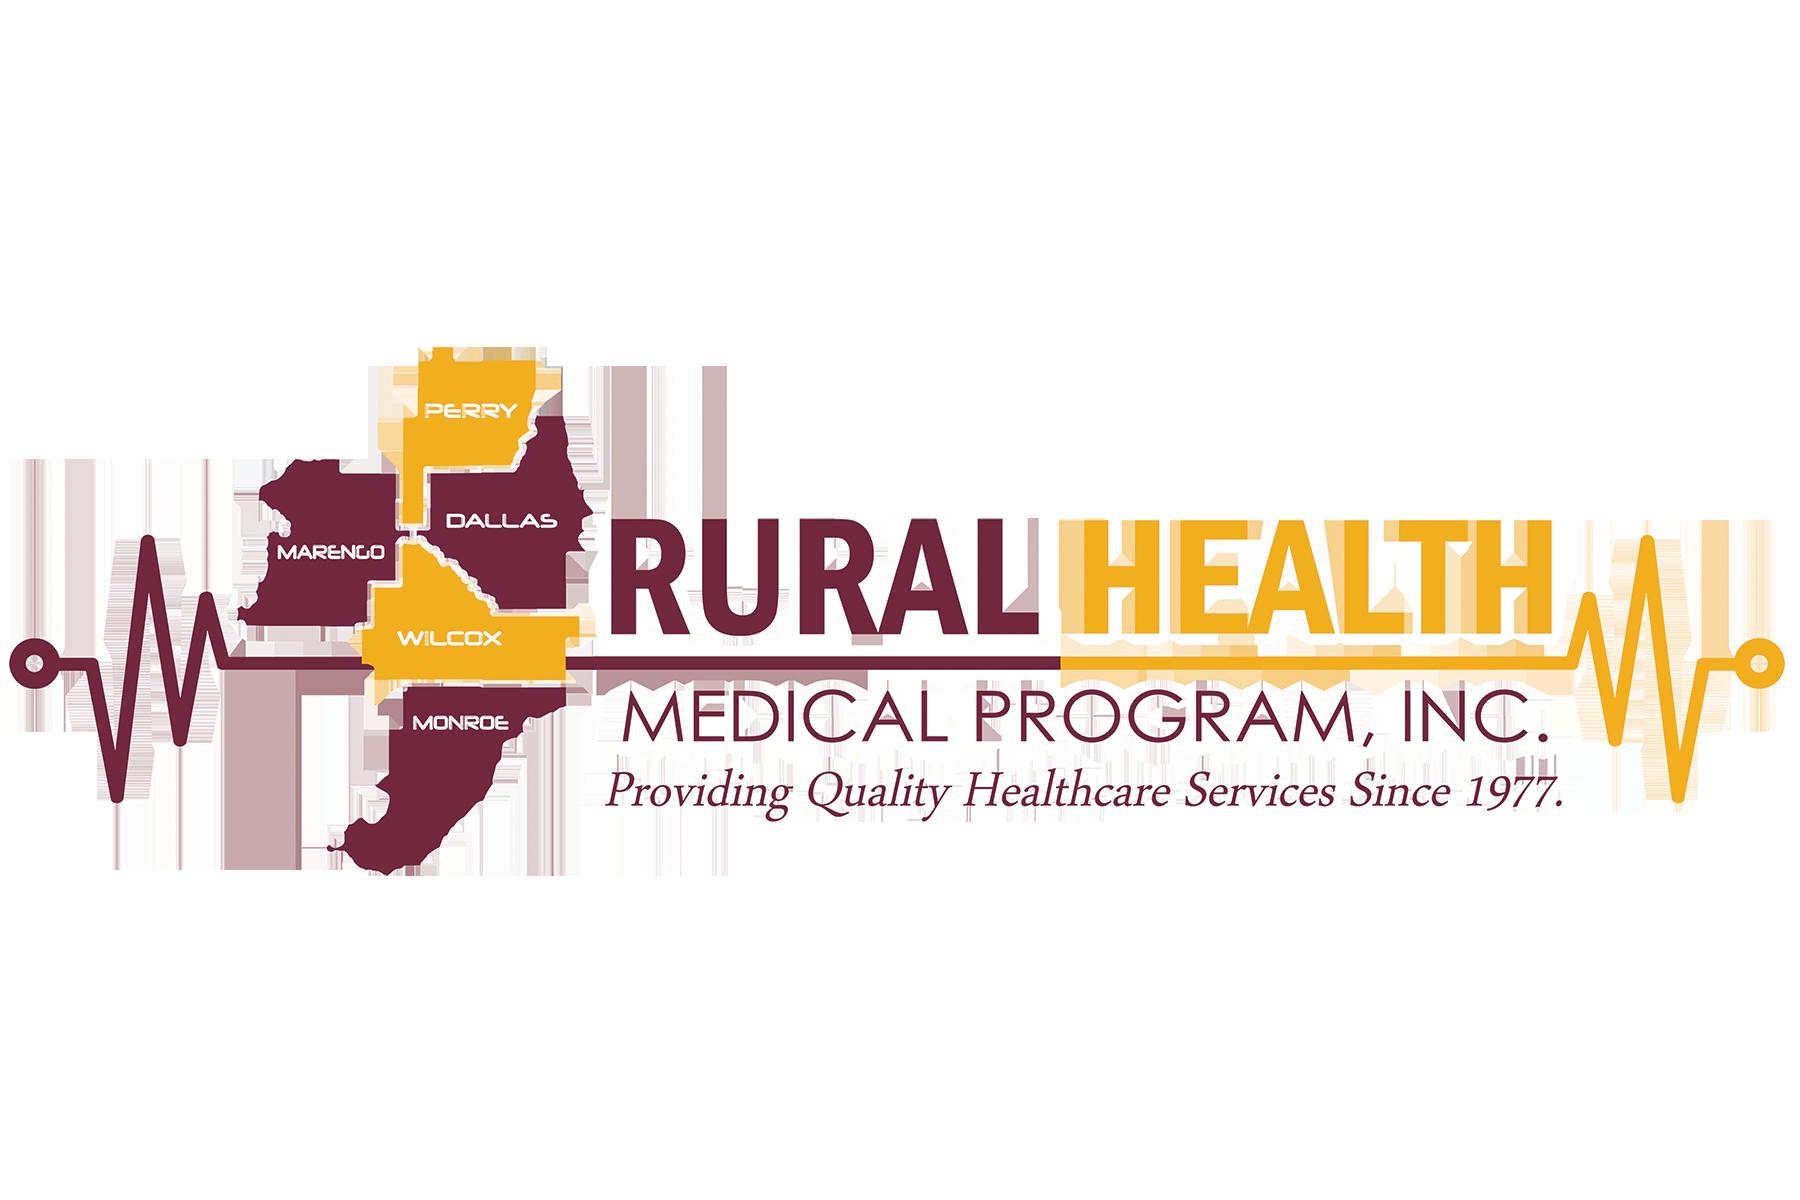 Rural Health Medical